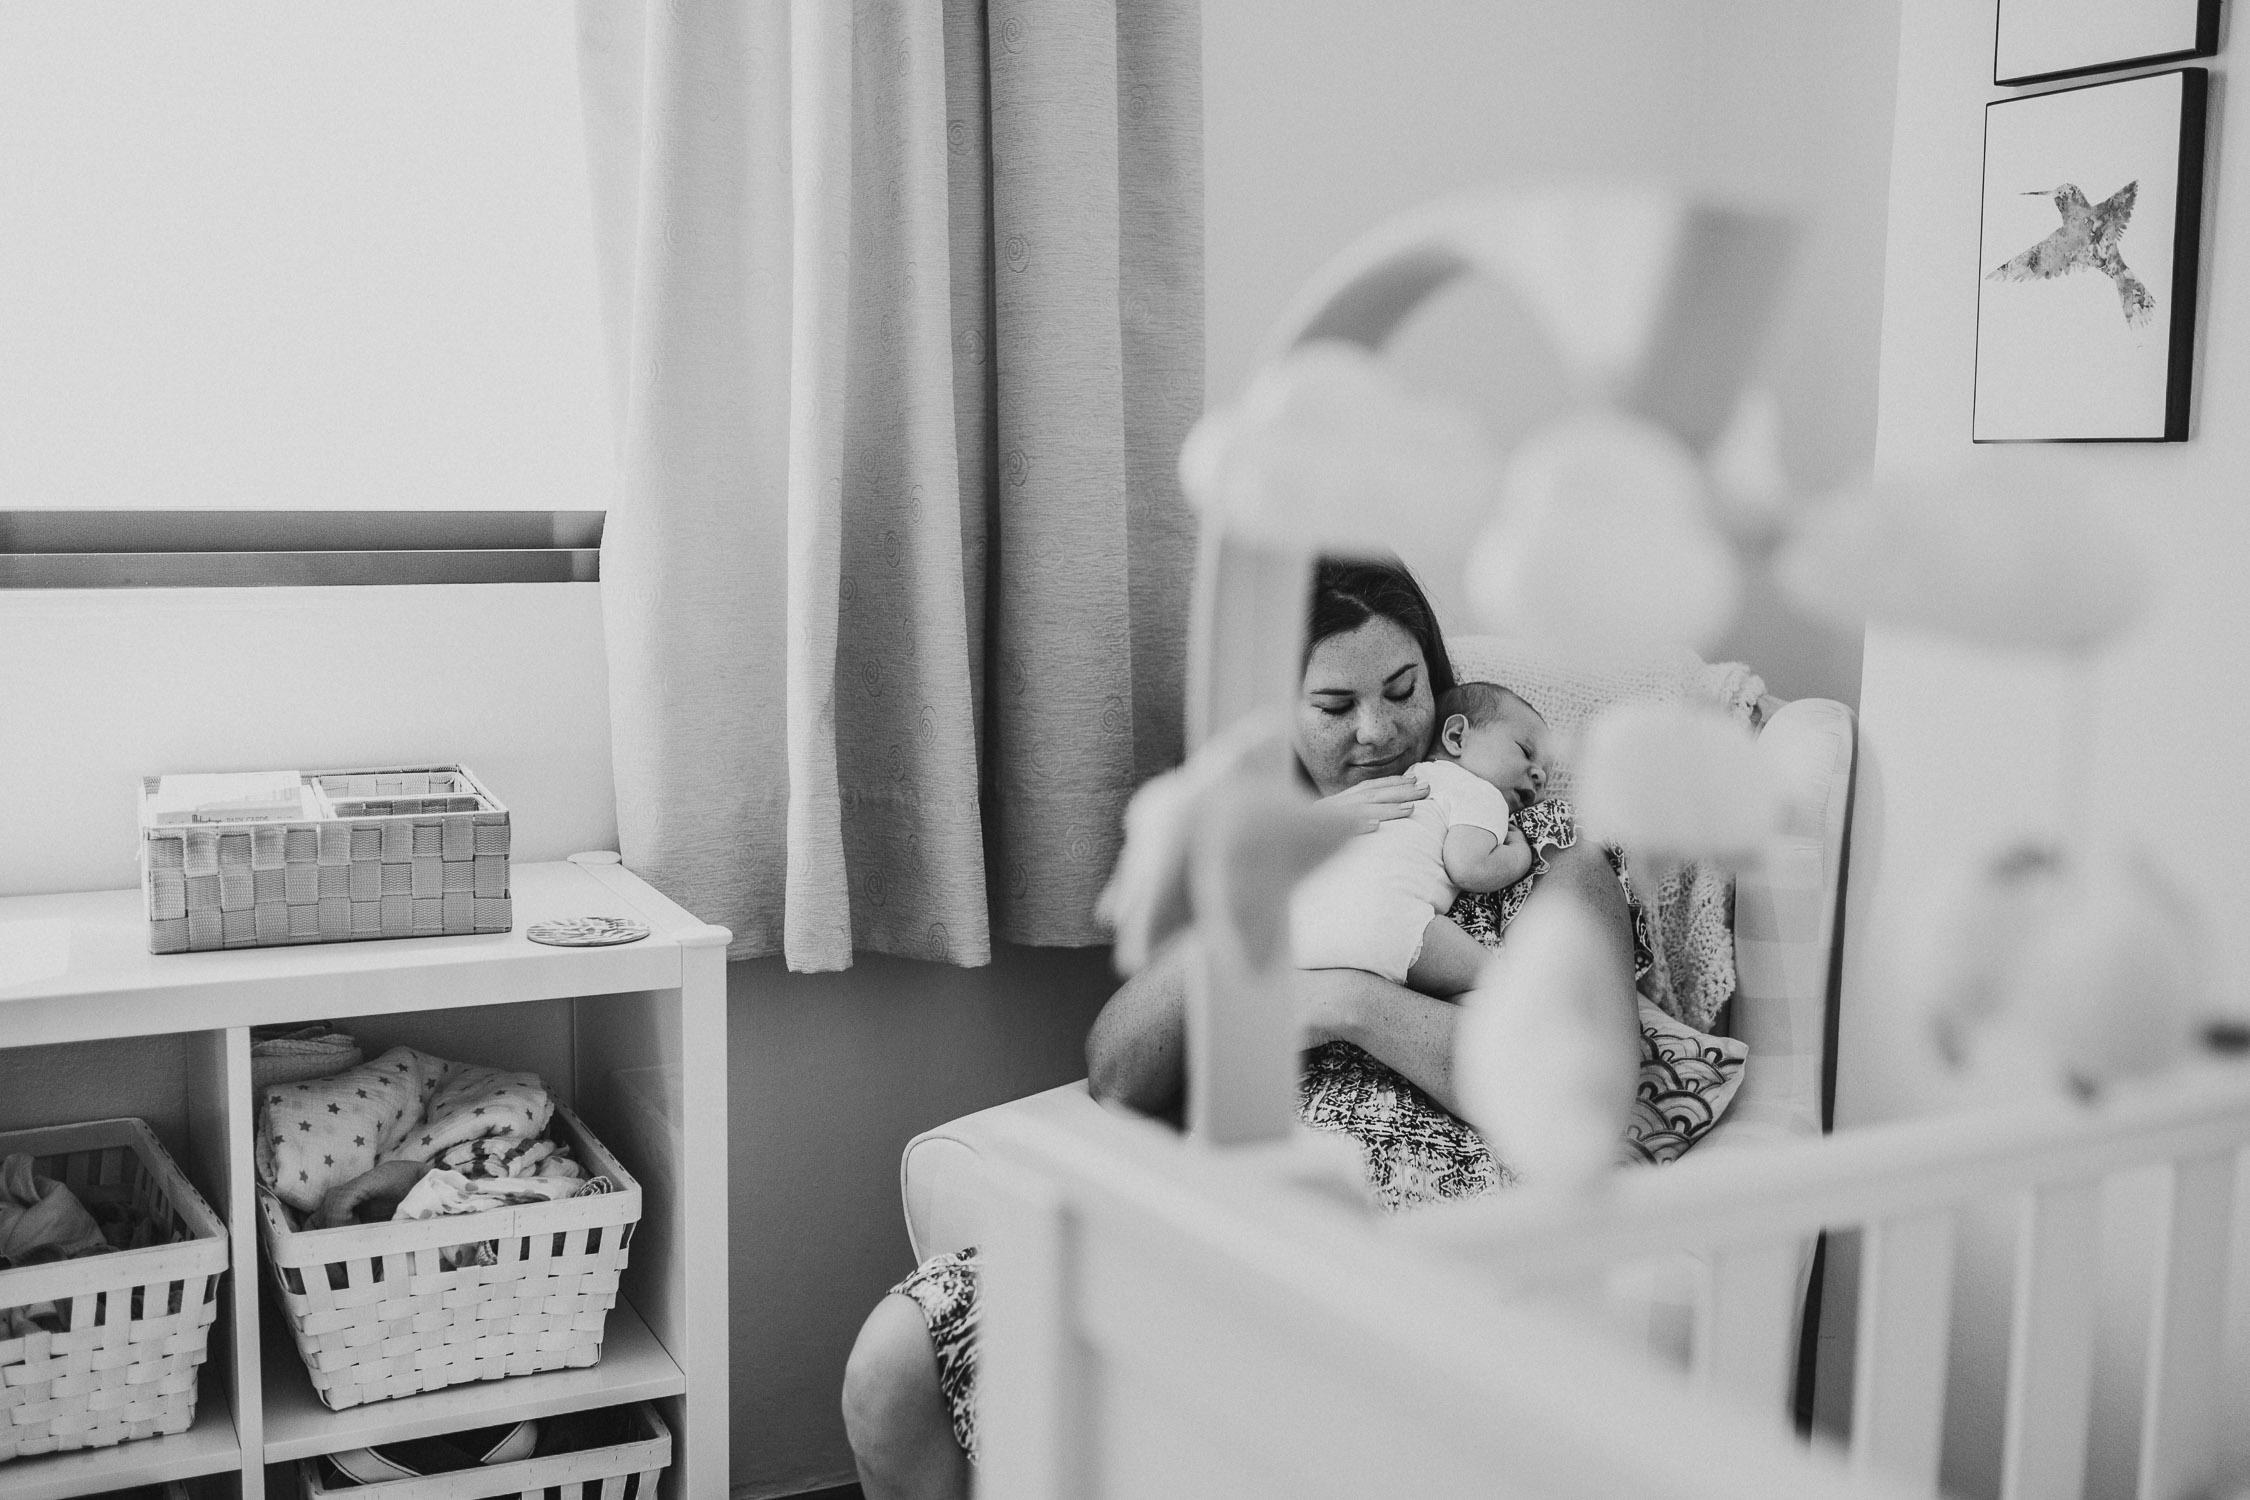 julia_whale_photography_newbornphotography-27.jpg